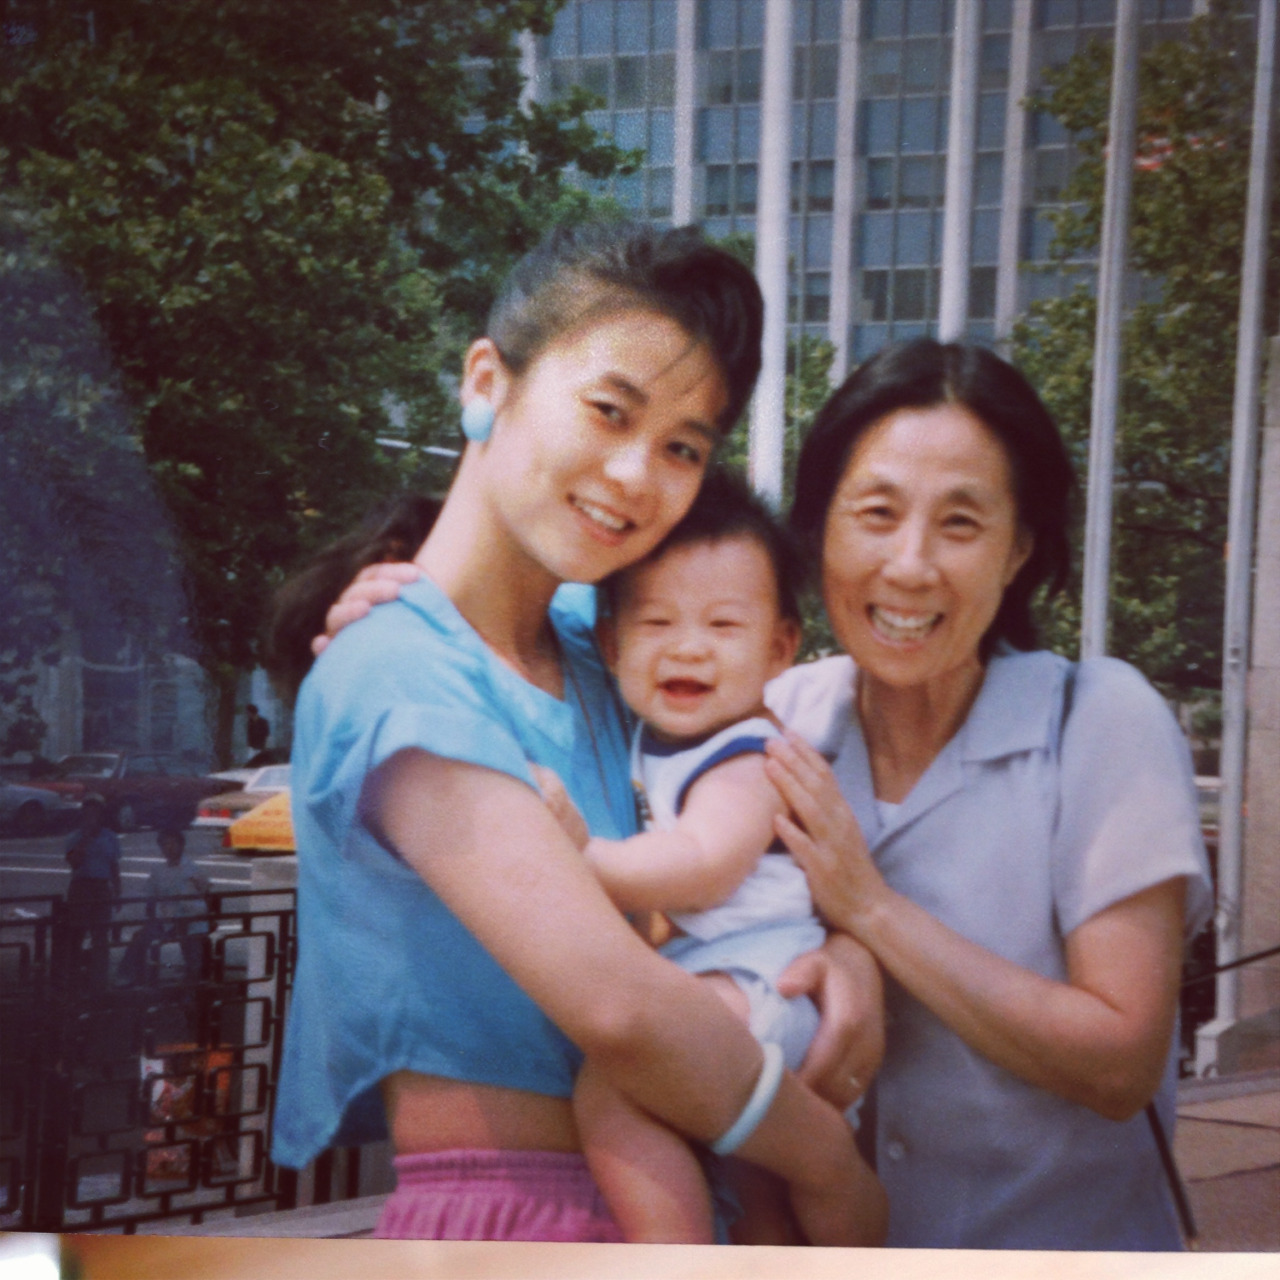 Mom, Mike, and grandma